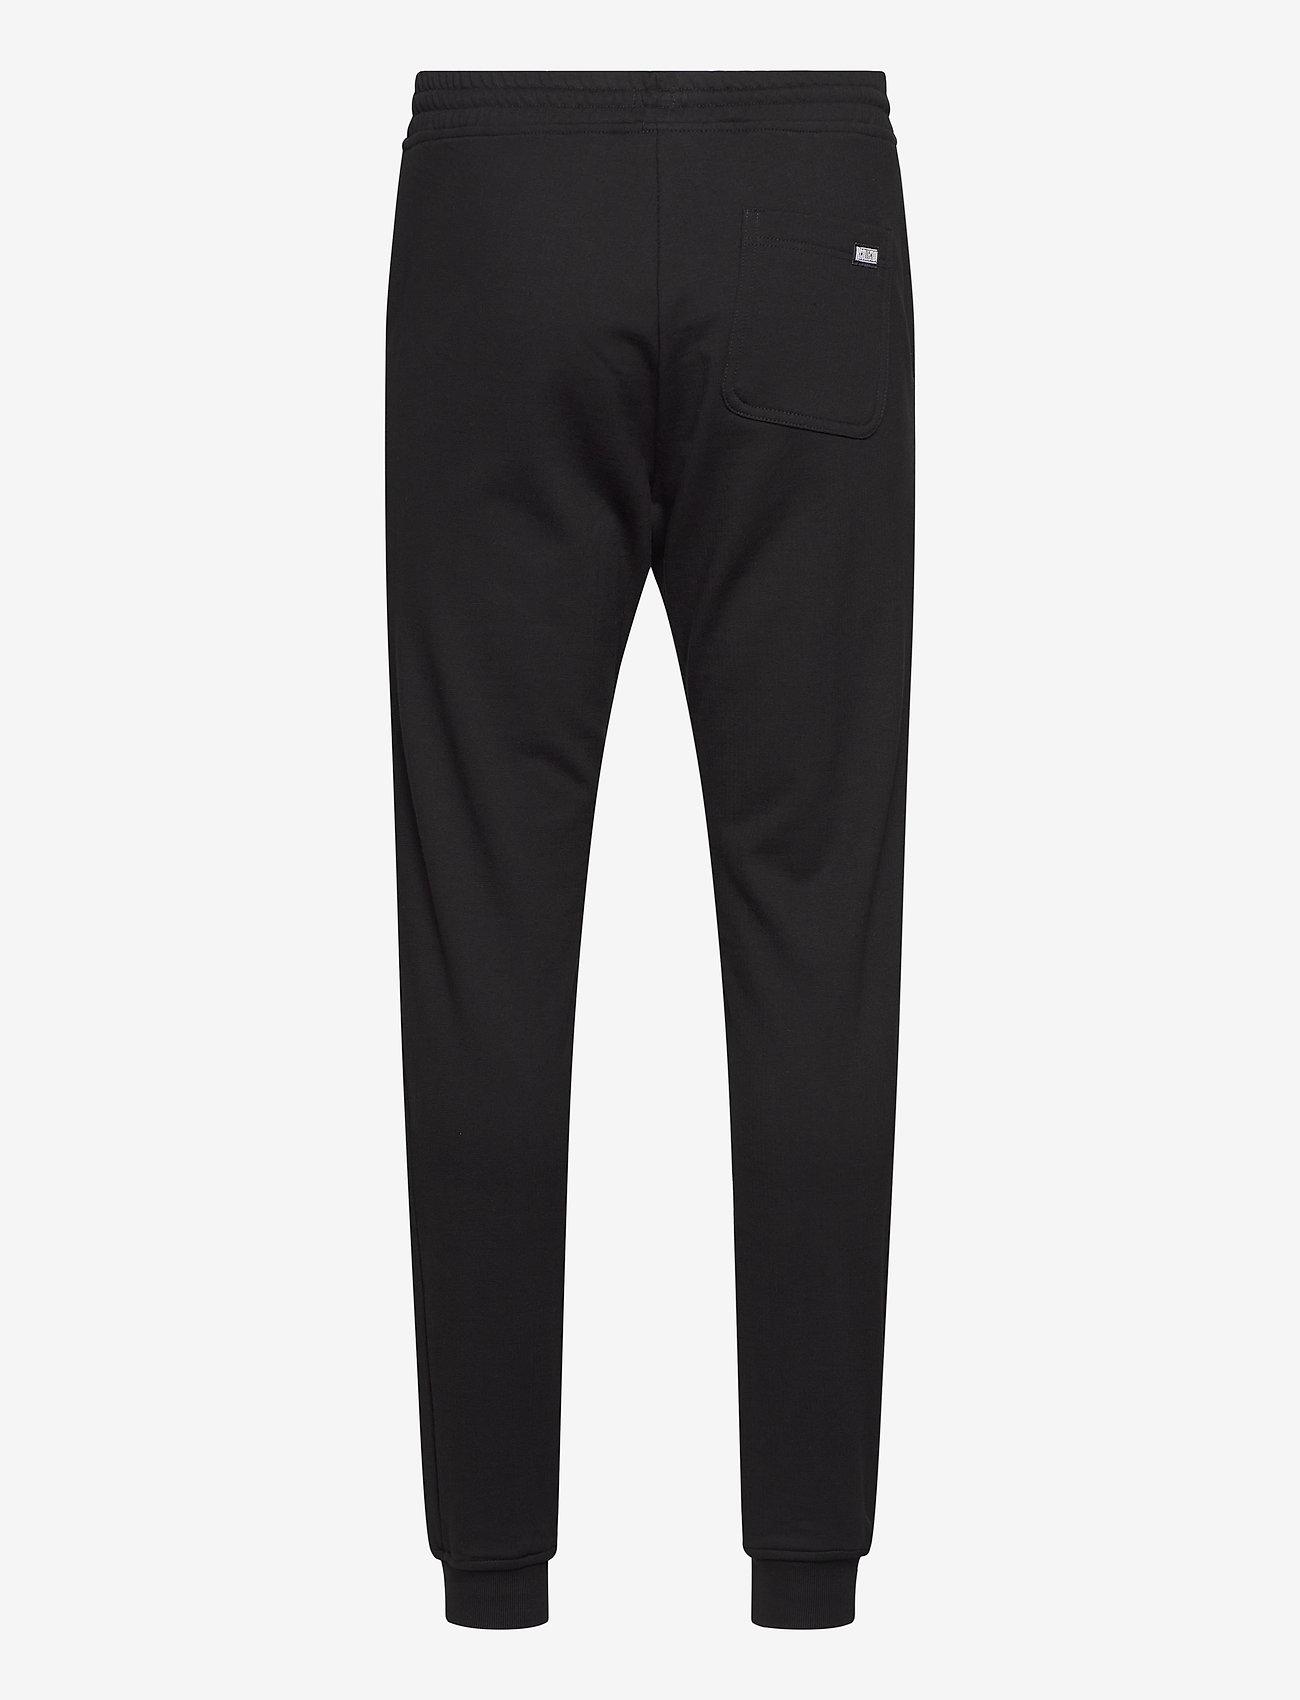 R-Collection Slim Sweatpants - Joggebukser BLACK - Menn Klær